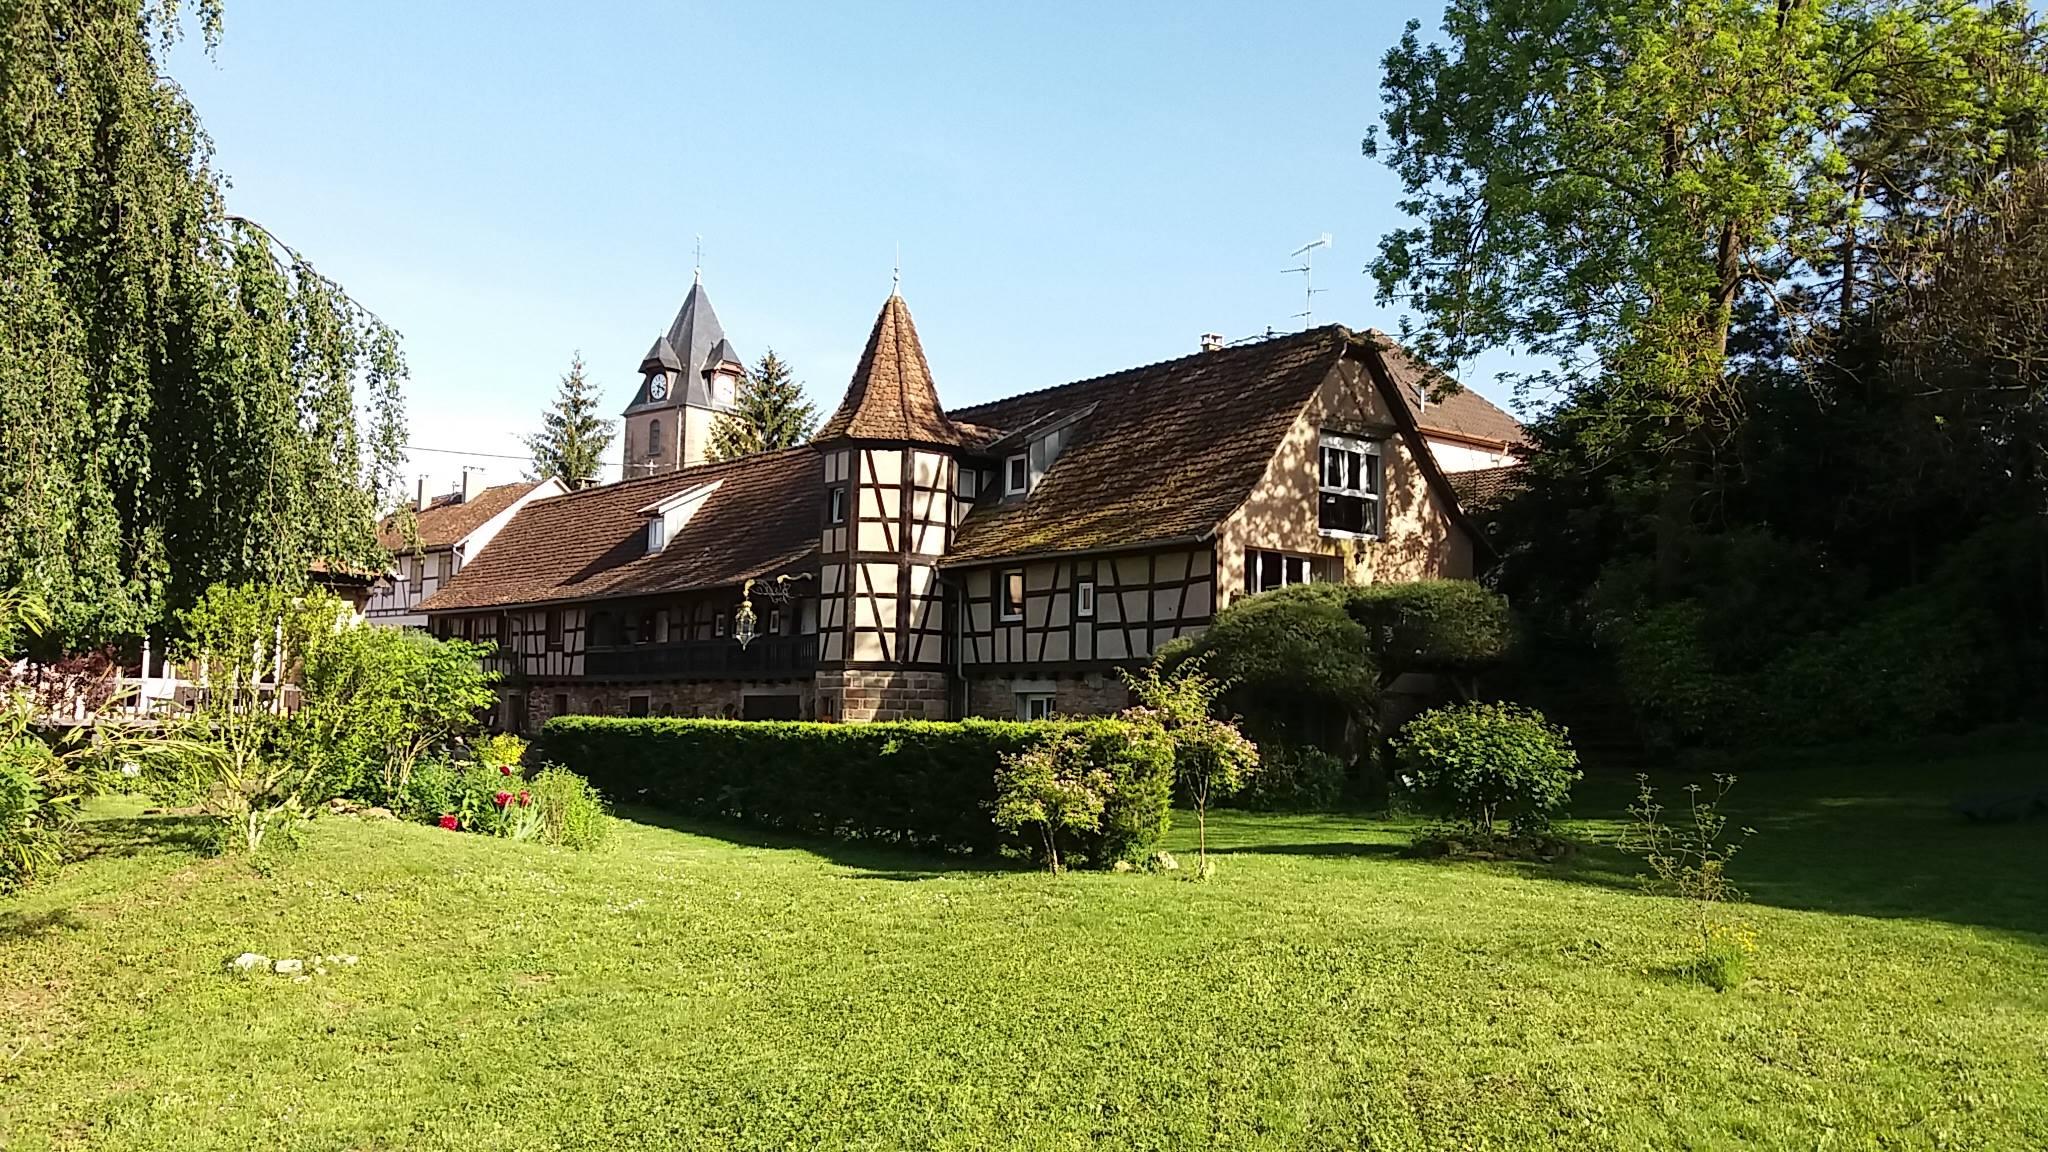 Meublé de tourisme La Tourelle de Mithra - Hertzele (Neugartheim Ittlenheim)